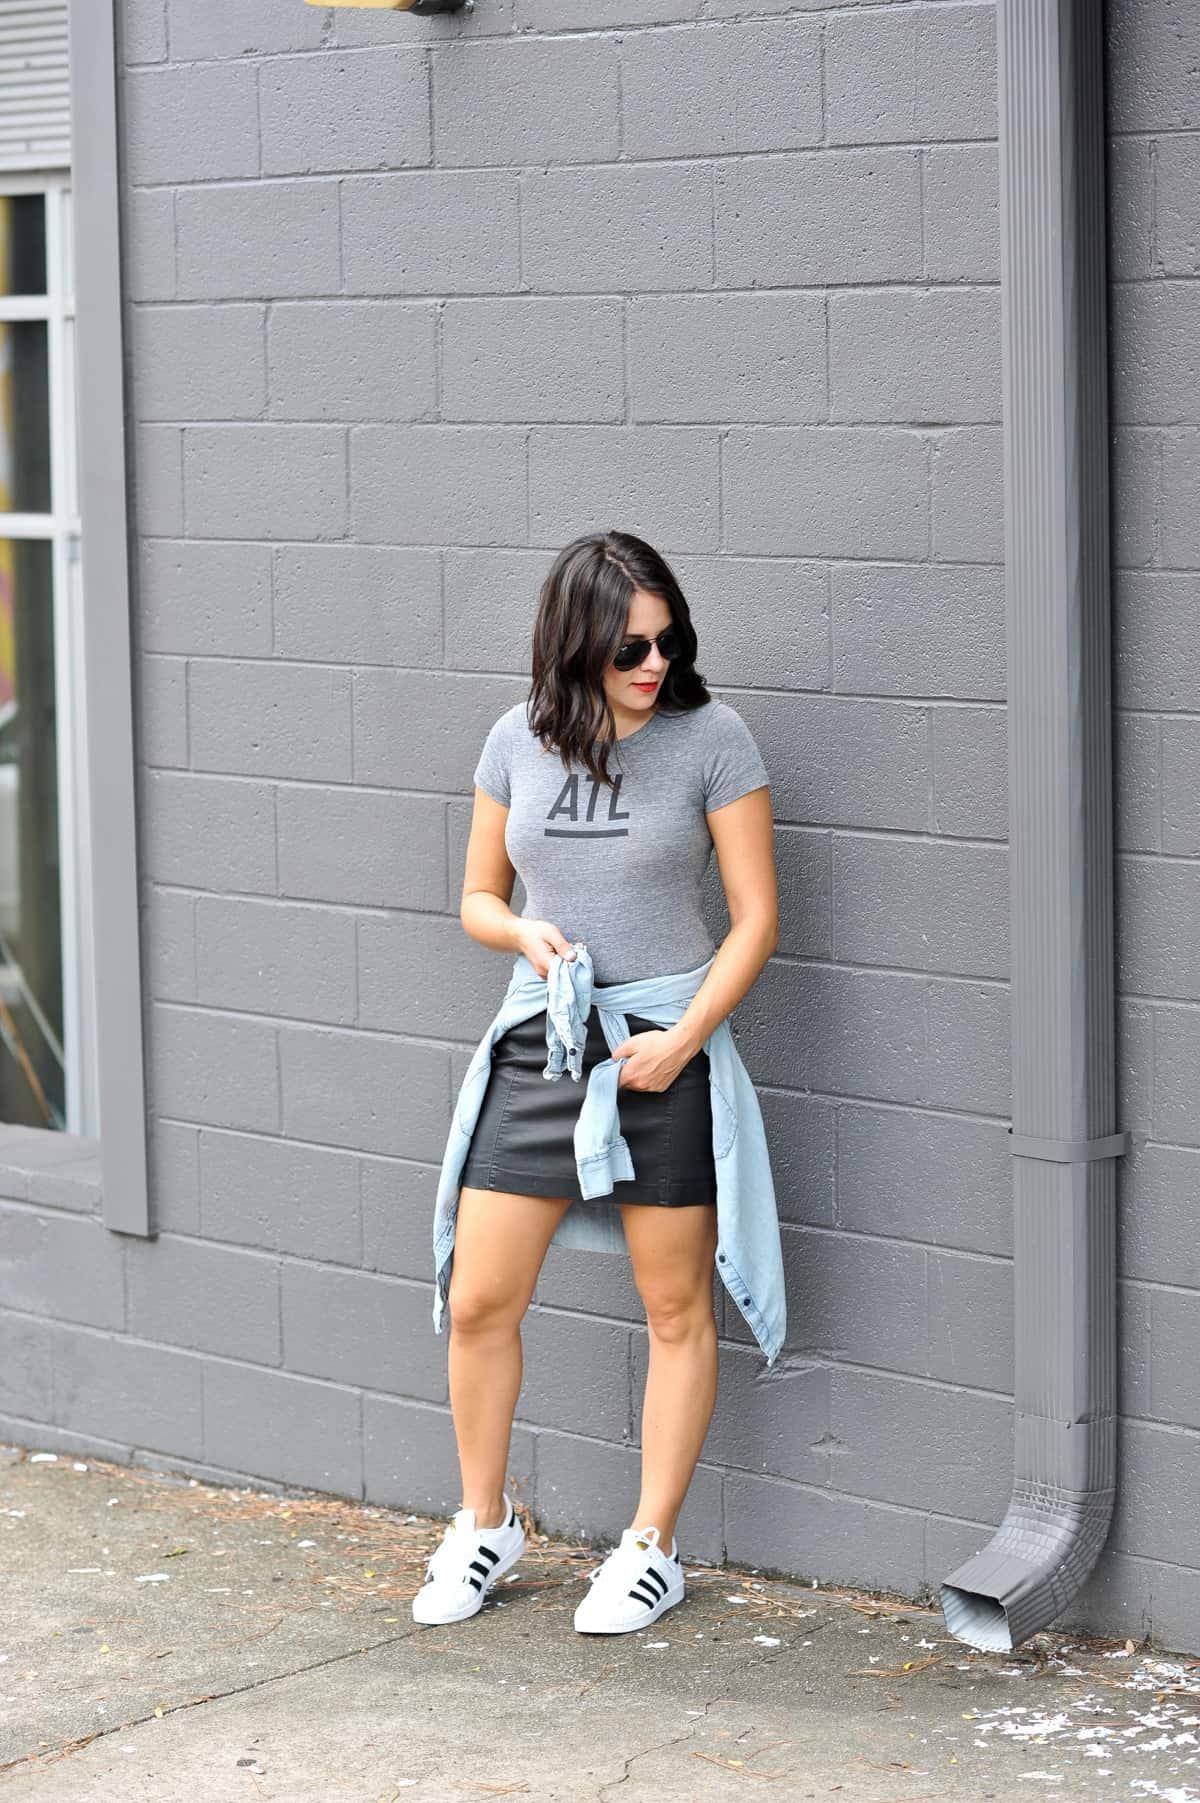 best atlanta based clothing brands, affordable outfit ideas, Adidas Superstars - My Style Vita - @mystylevita - 20